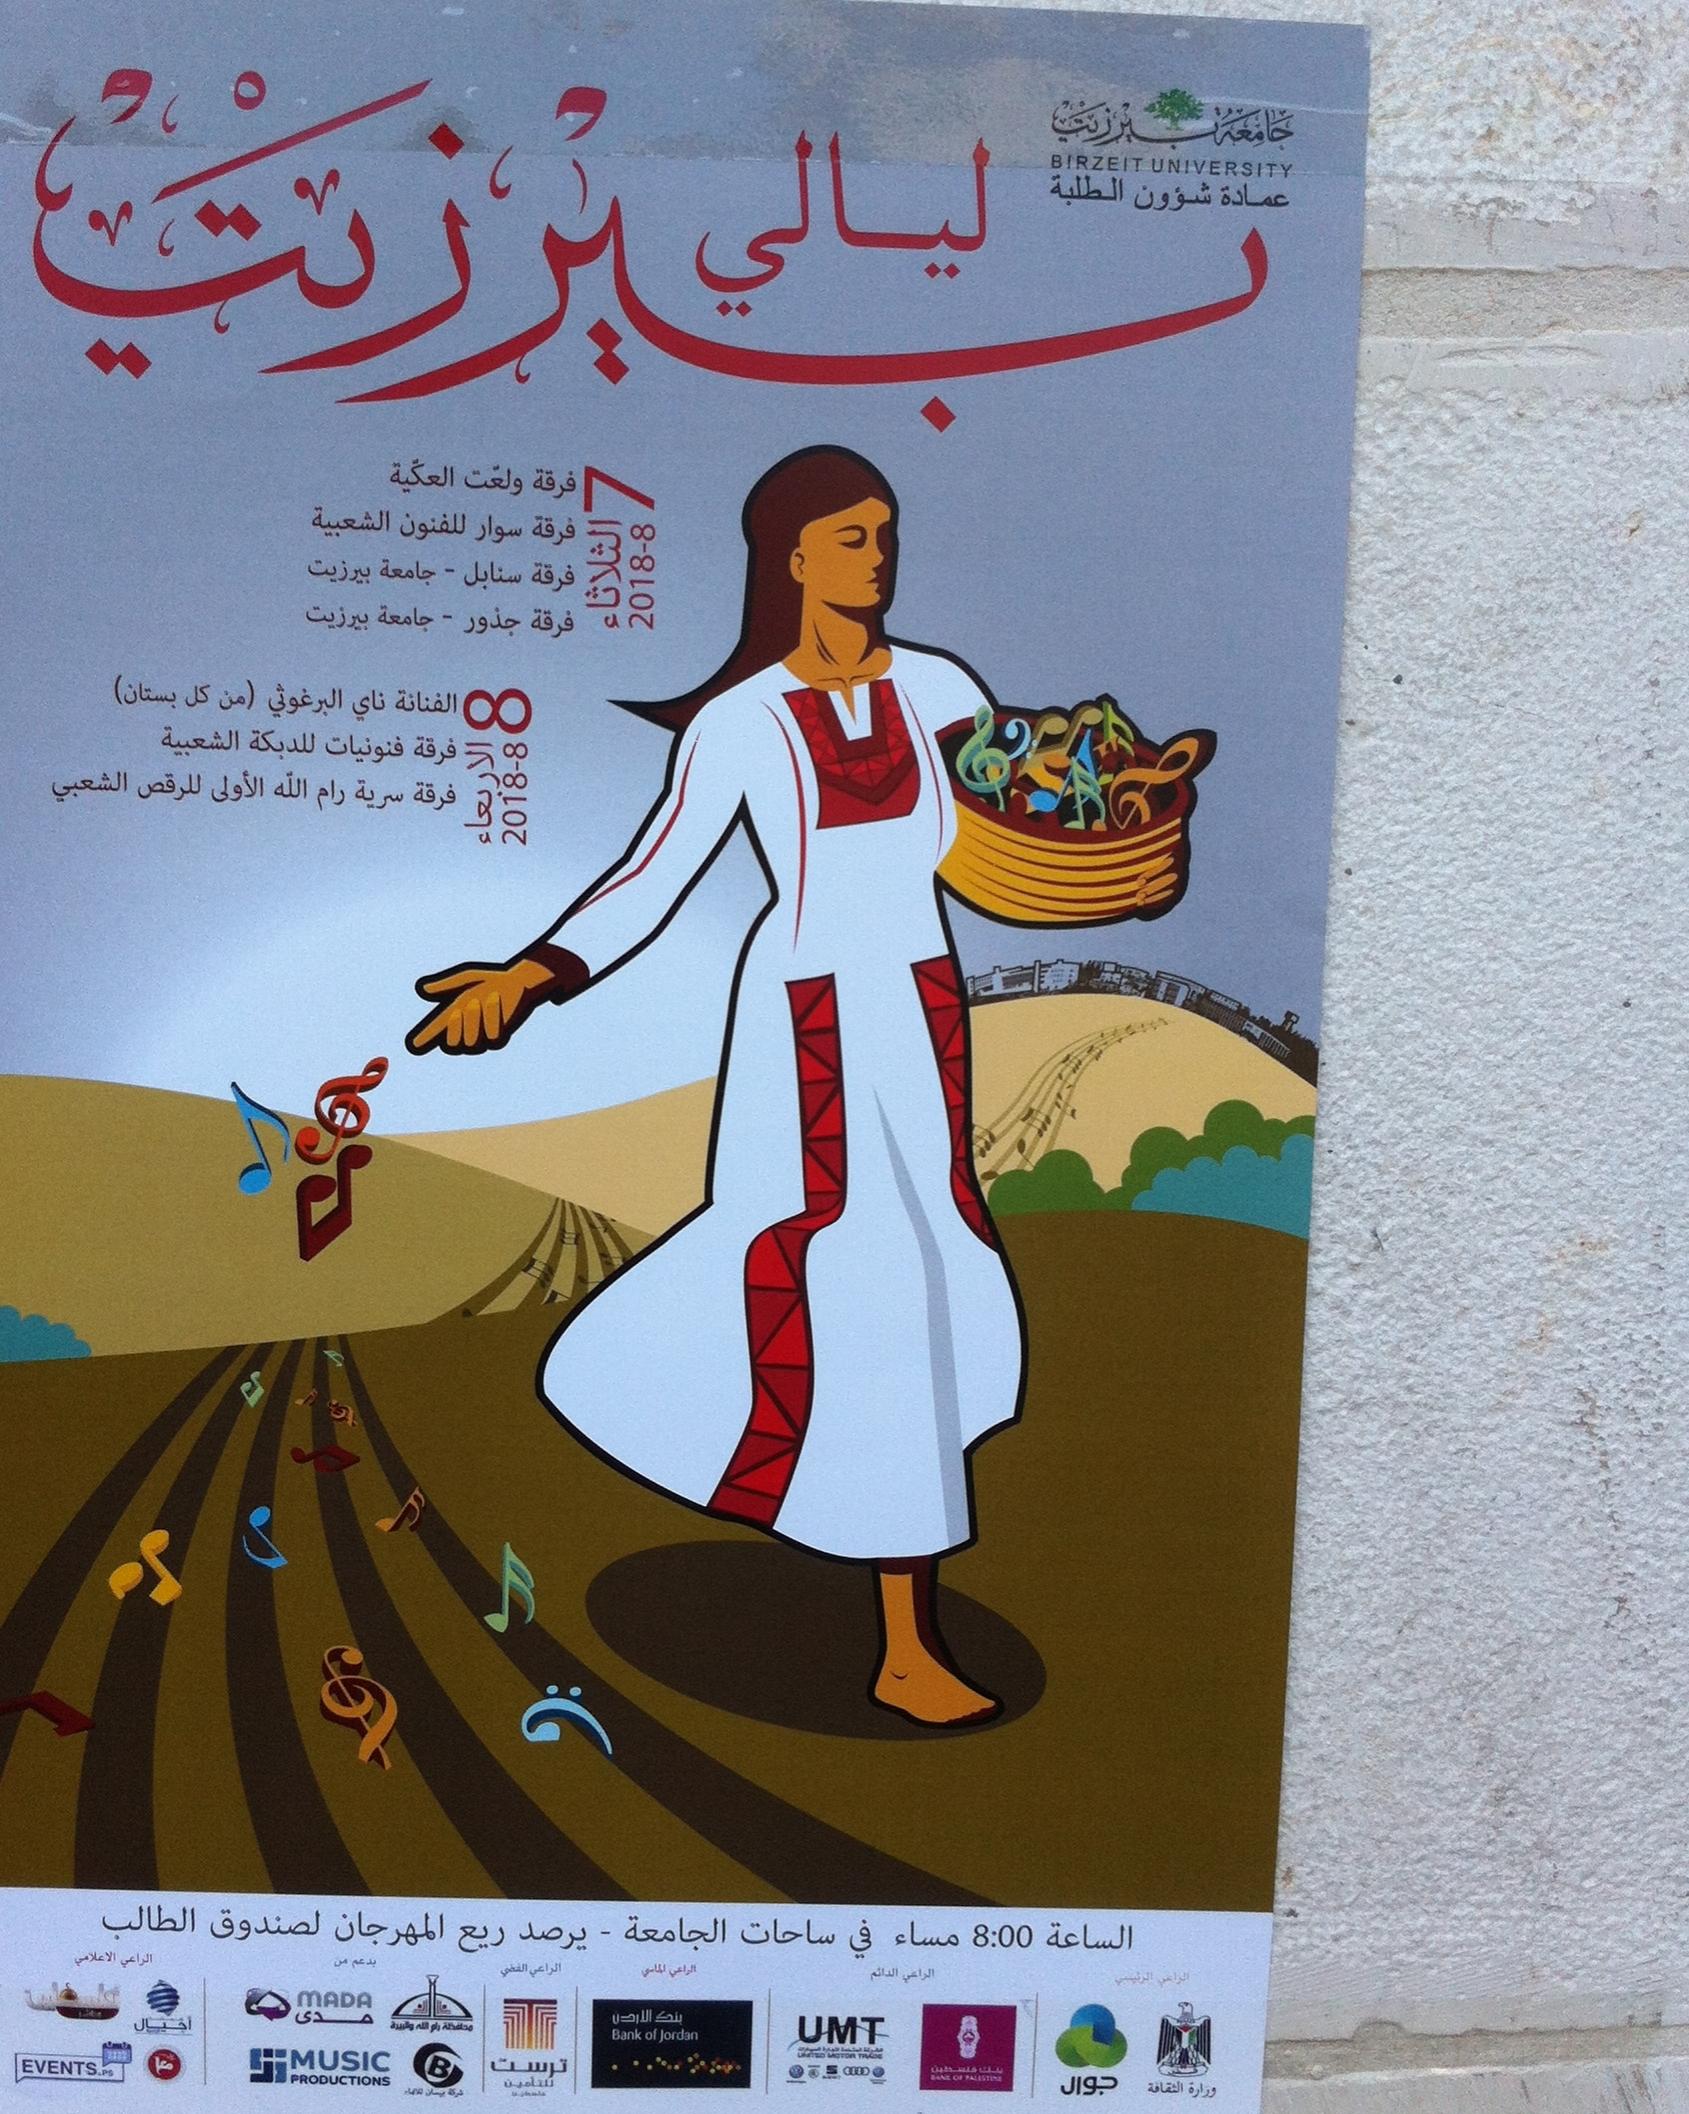 Ramallah, Palestine, August 2018